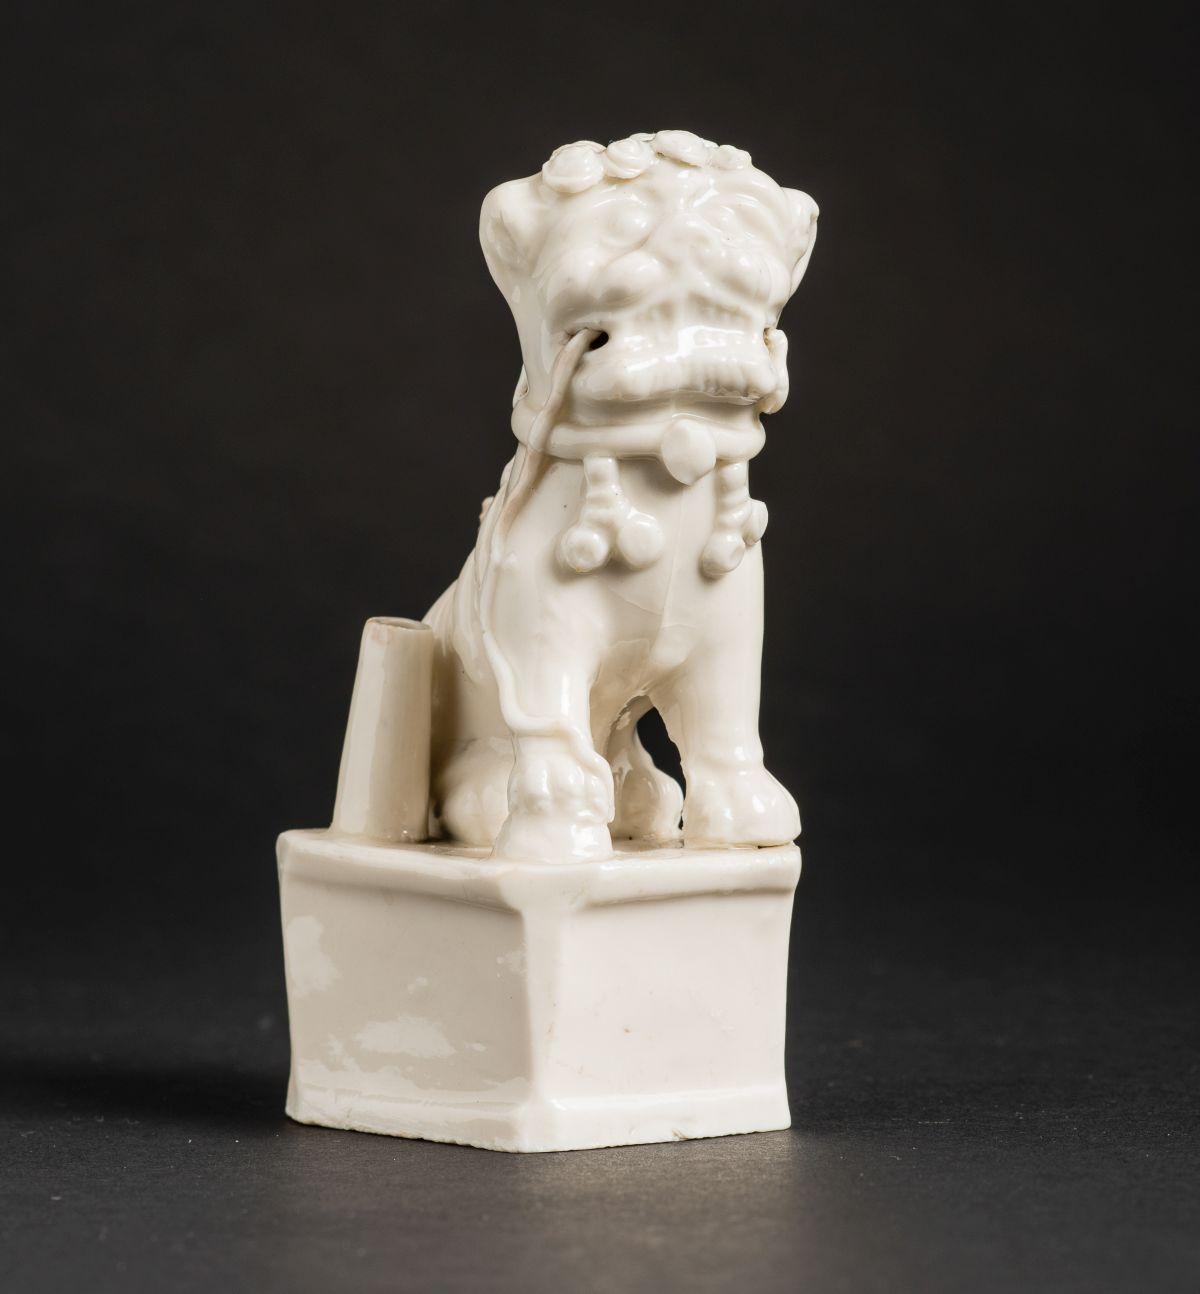 #74 Guardian Lion (Fo-Lion) on Pedestal   Wächterlöwe (Fo-Löwe) auf Sockel Image